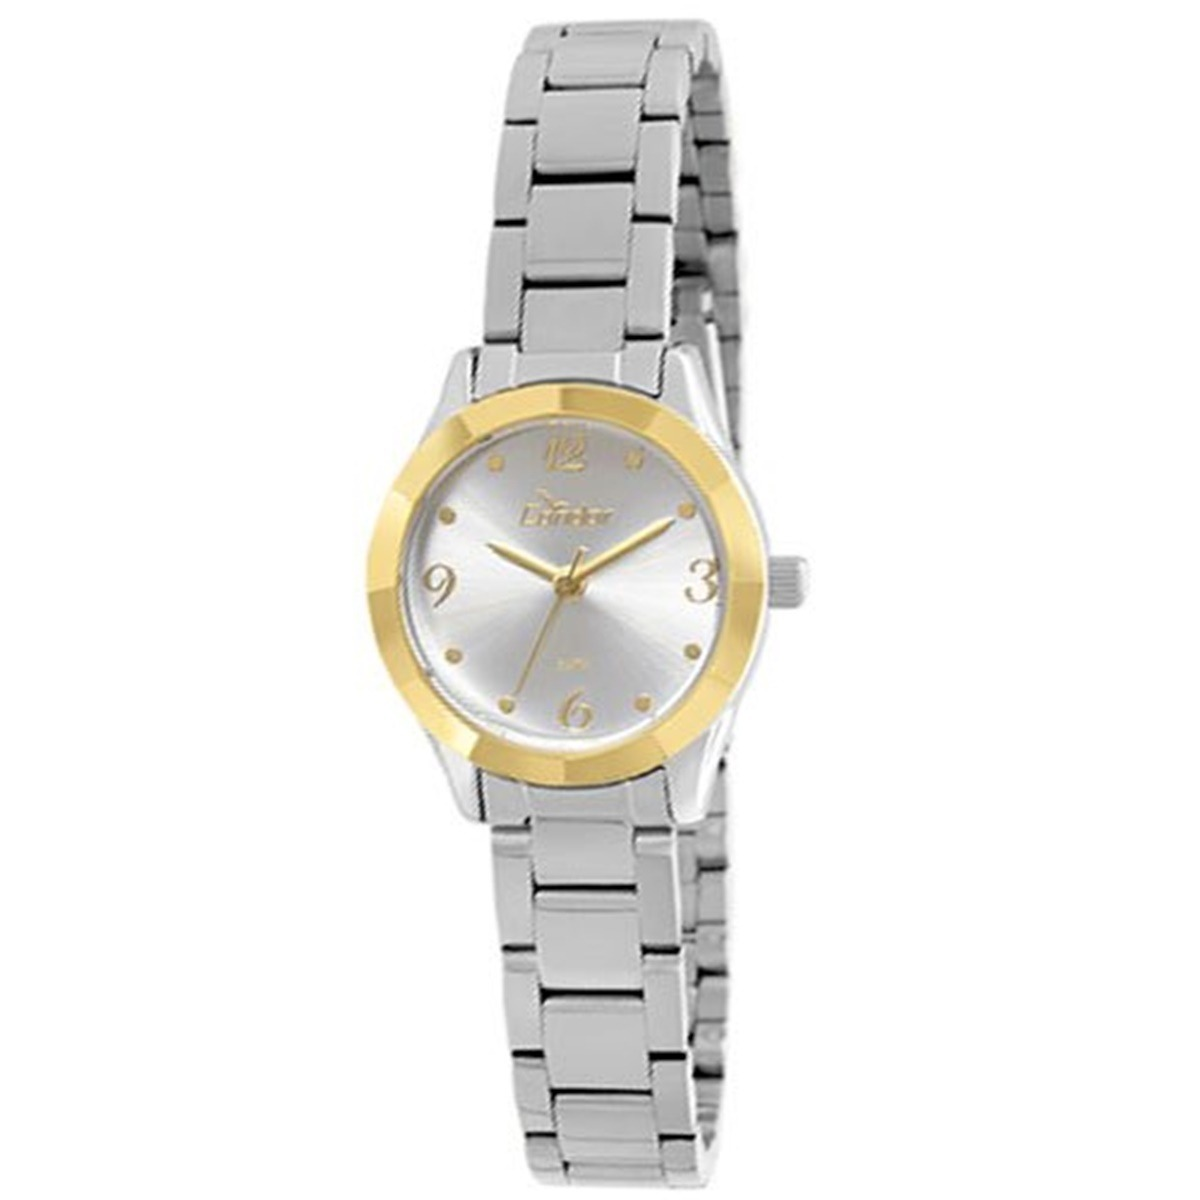 69b77bcdd26 relógio condor feminino aço prata social barato co2035krd 3k. Carregando  zoom.